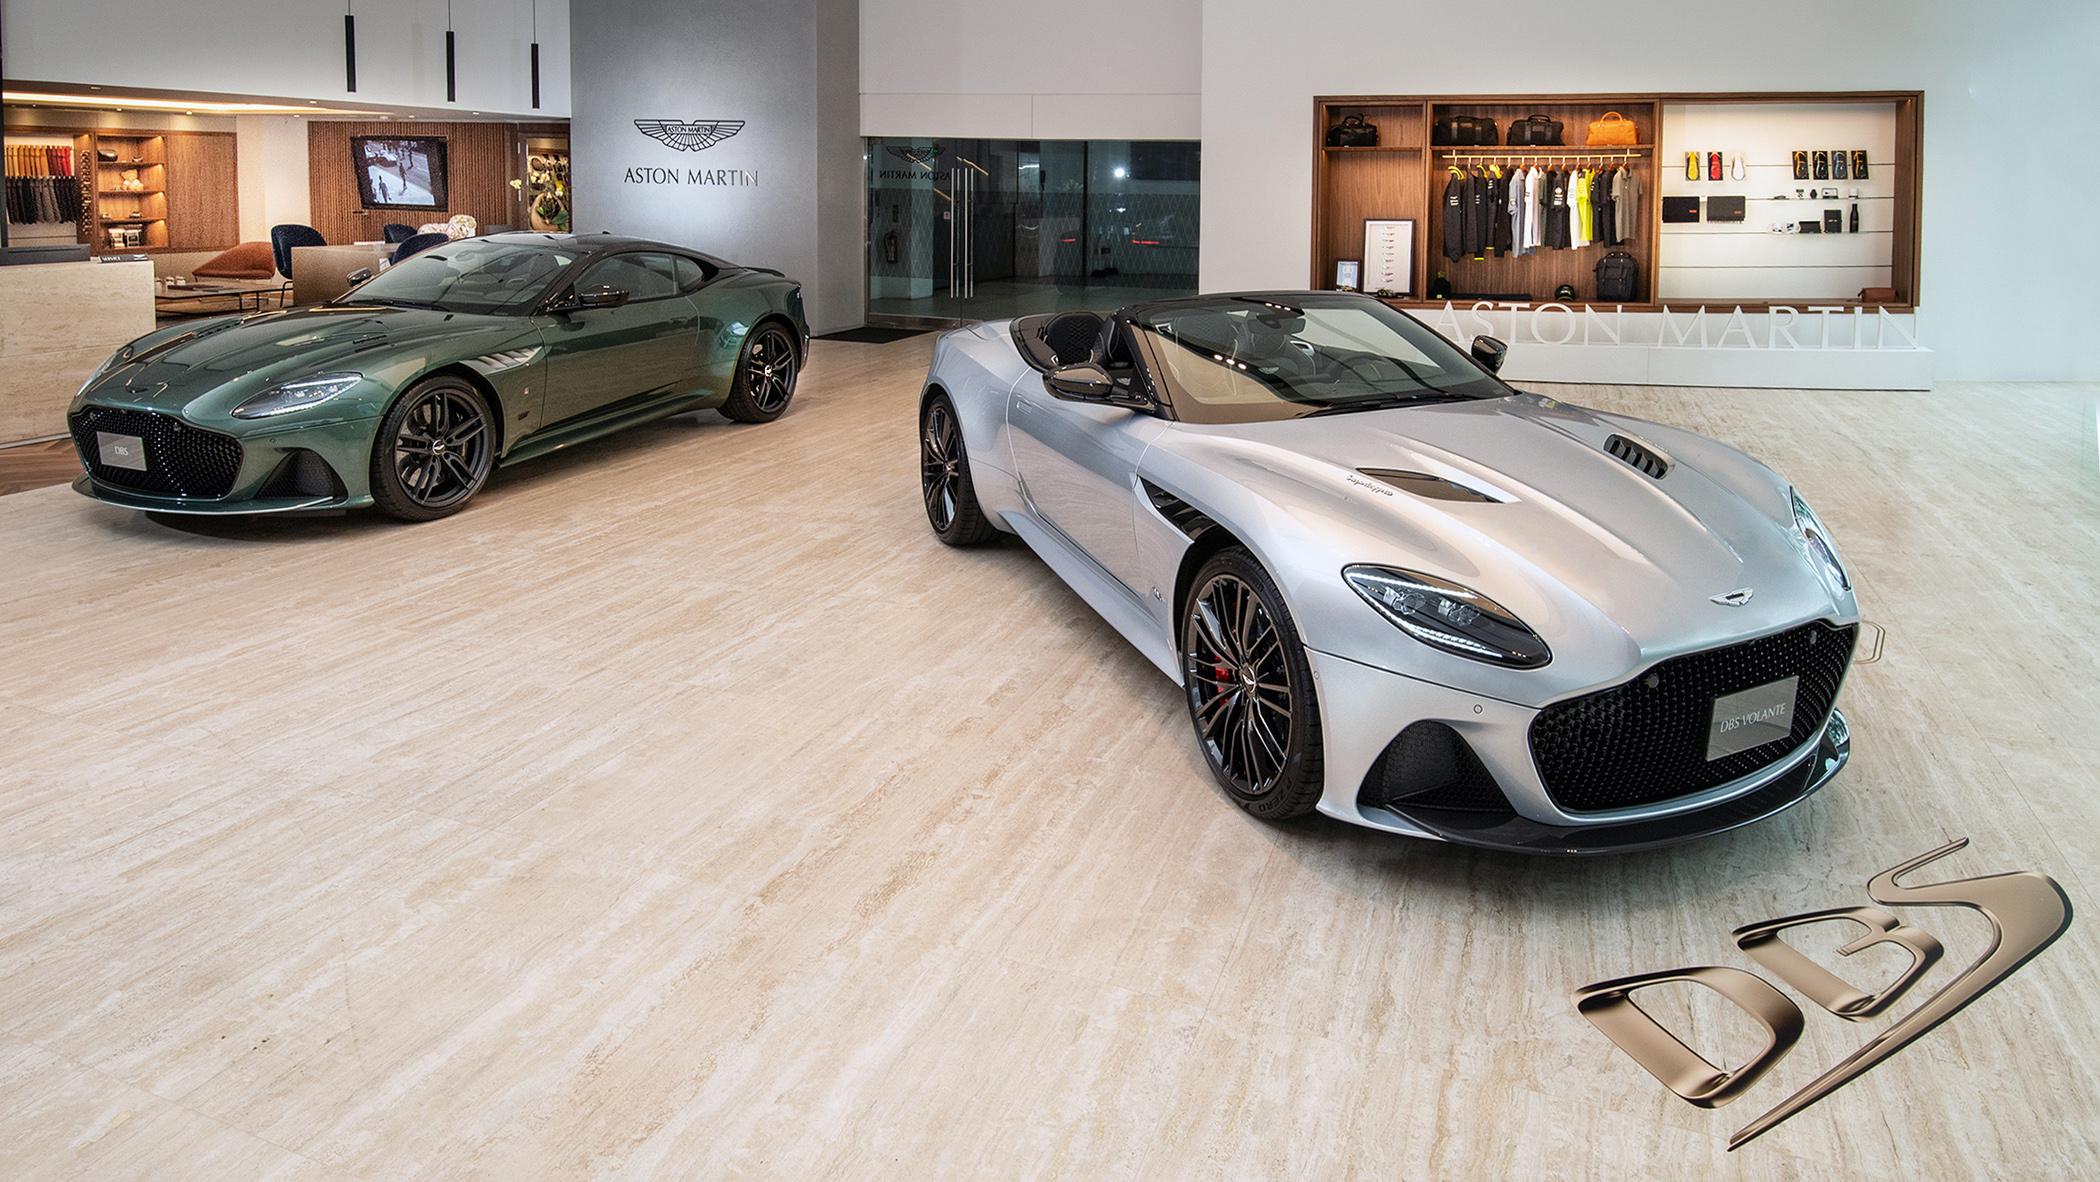 Aston Martin DBS Superleggera Volante V12 敞篷 GT 超跑 1,848 萬起抵台